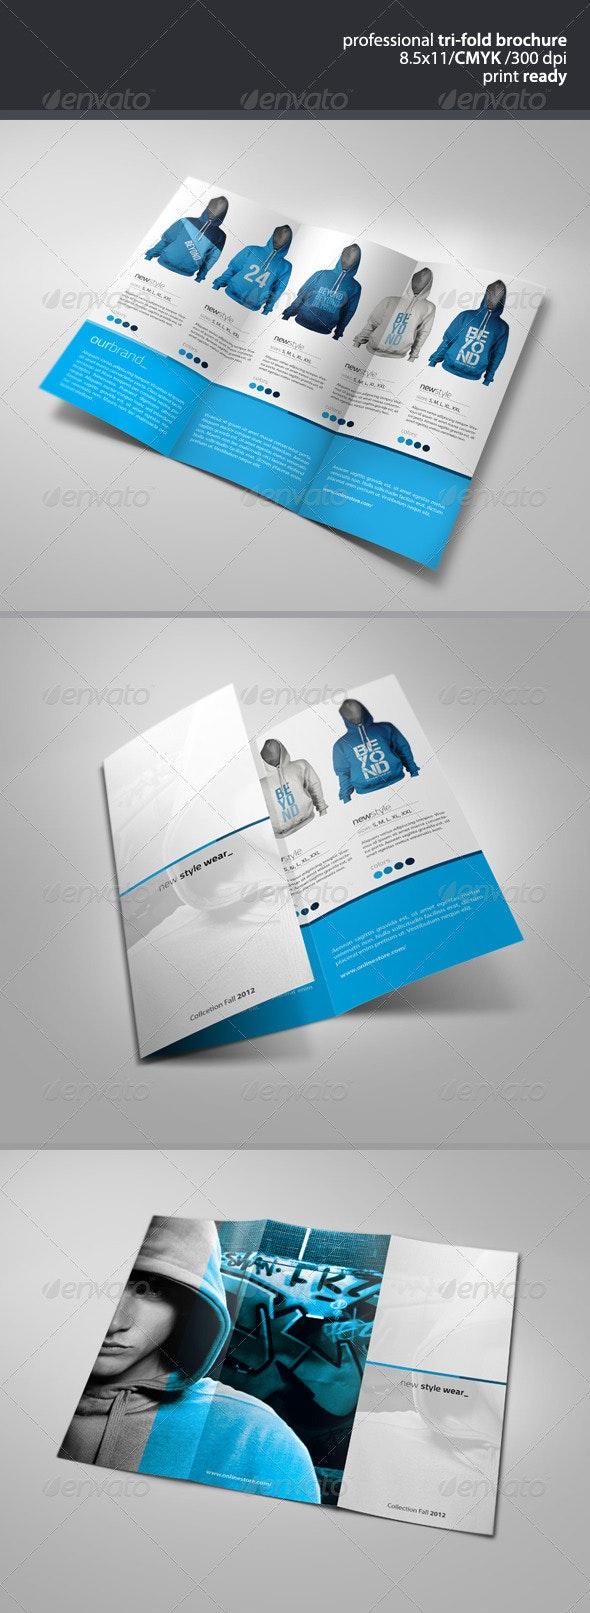 Apparel Tri-Fold Brochure 2 - Brochures Print Templates